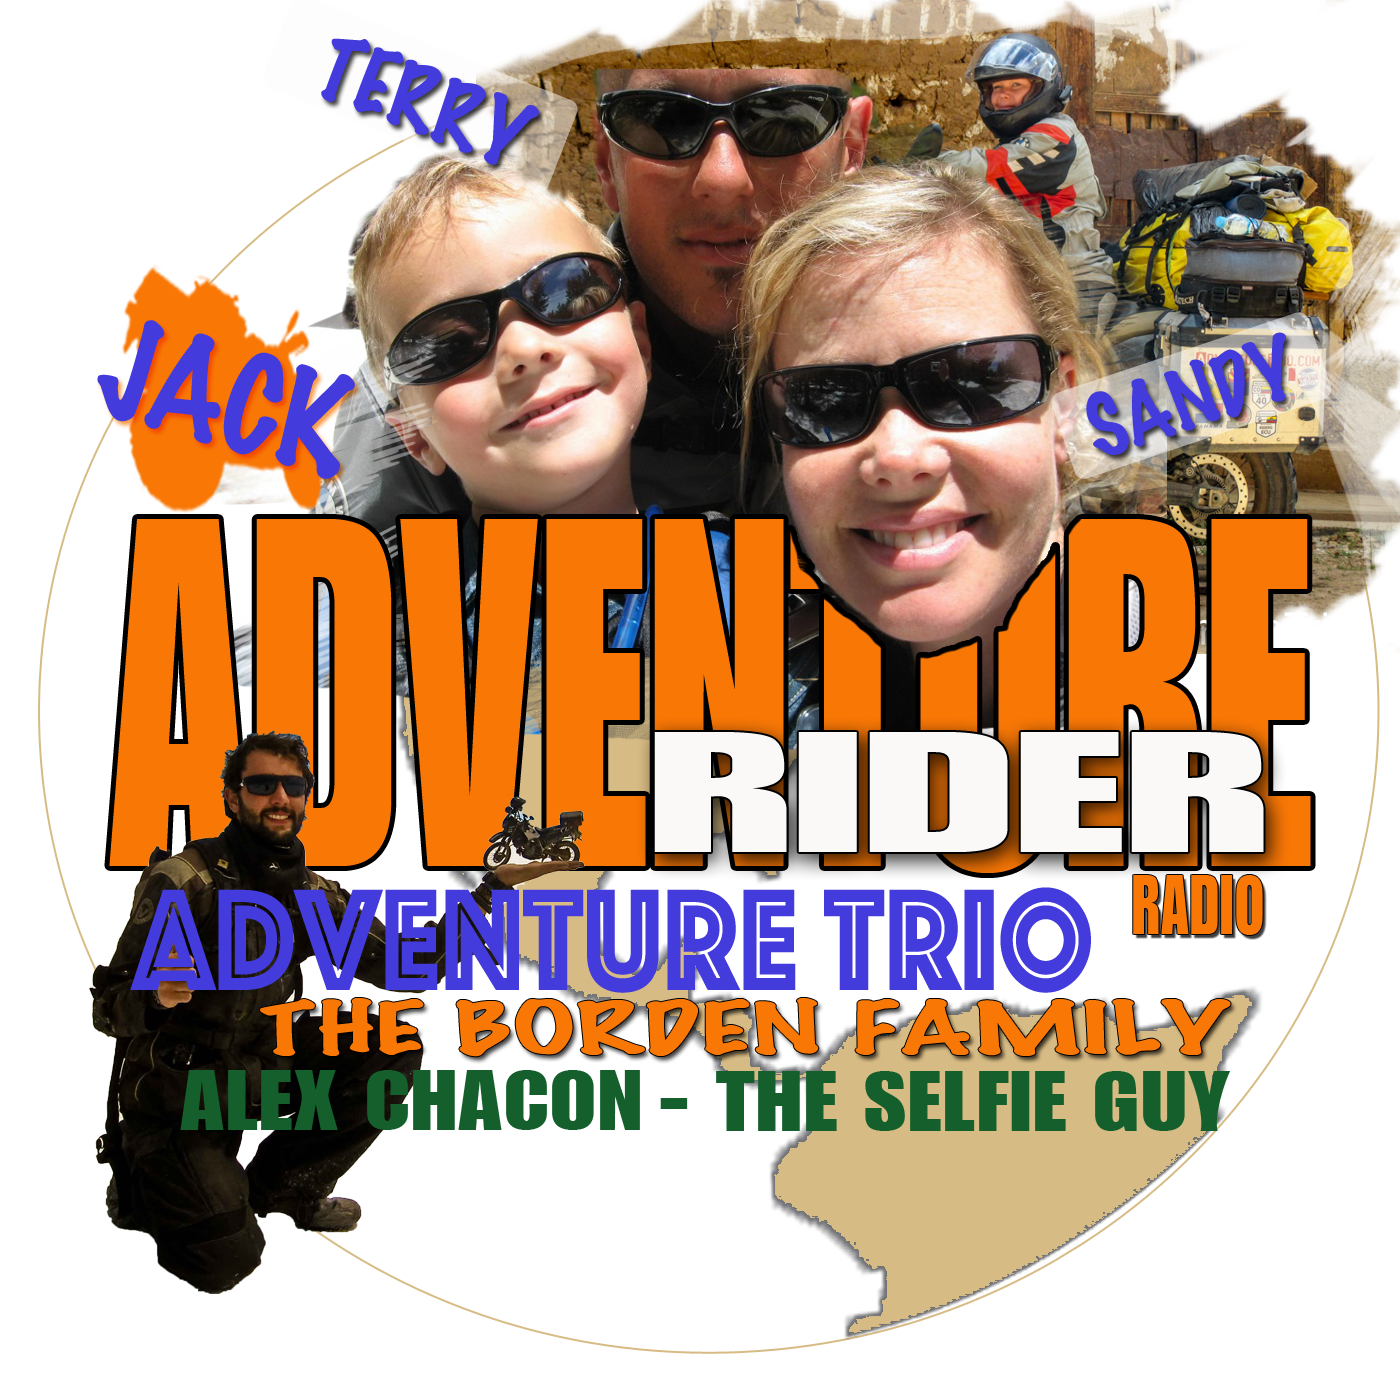 The-Adventure-Trio-Borden-Family